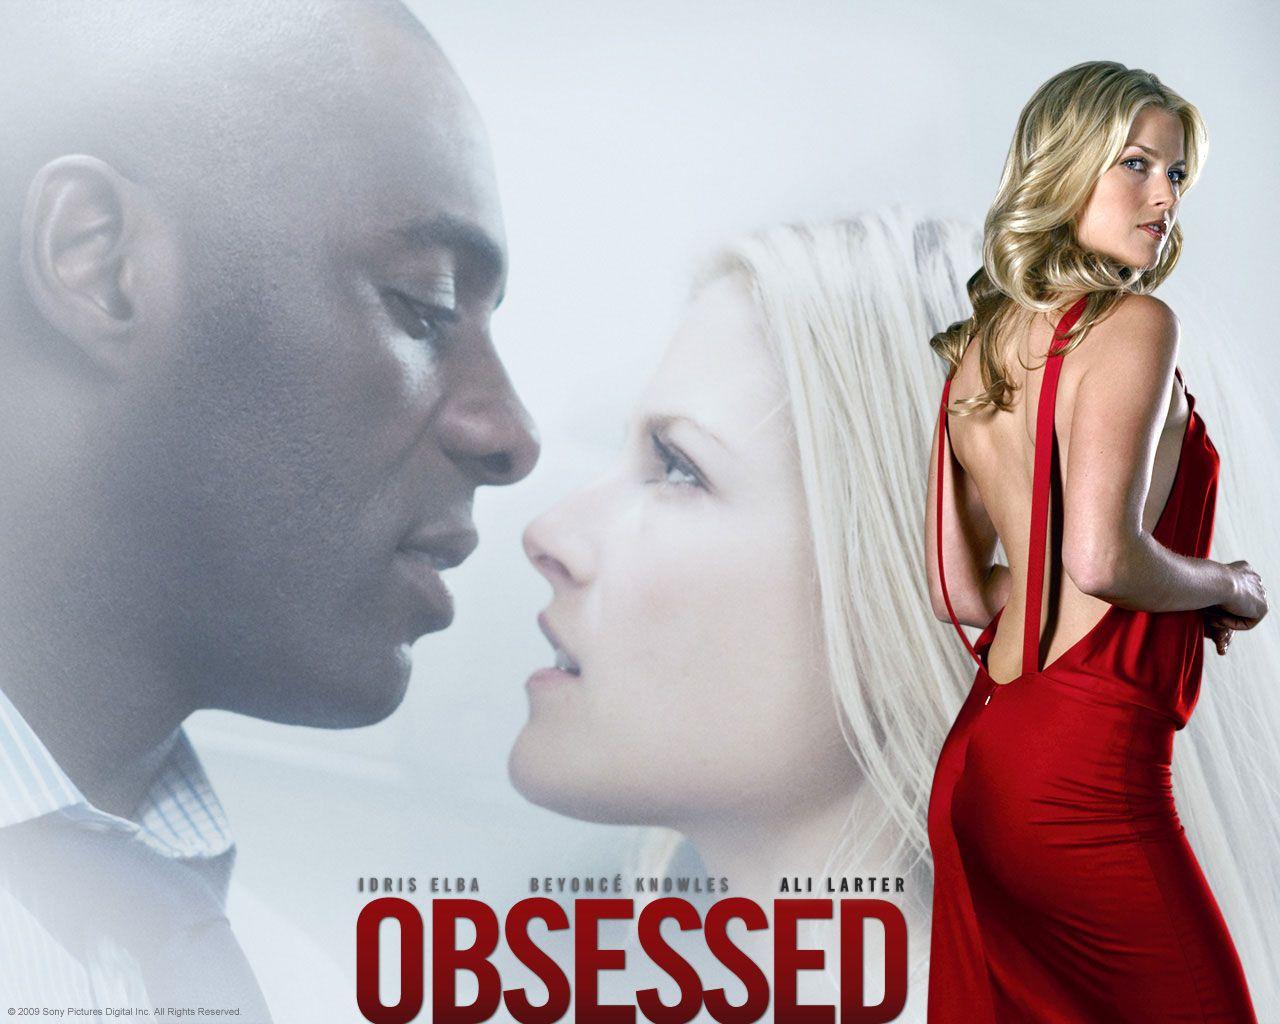 Ali larter has sex in obsessed